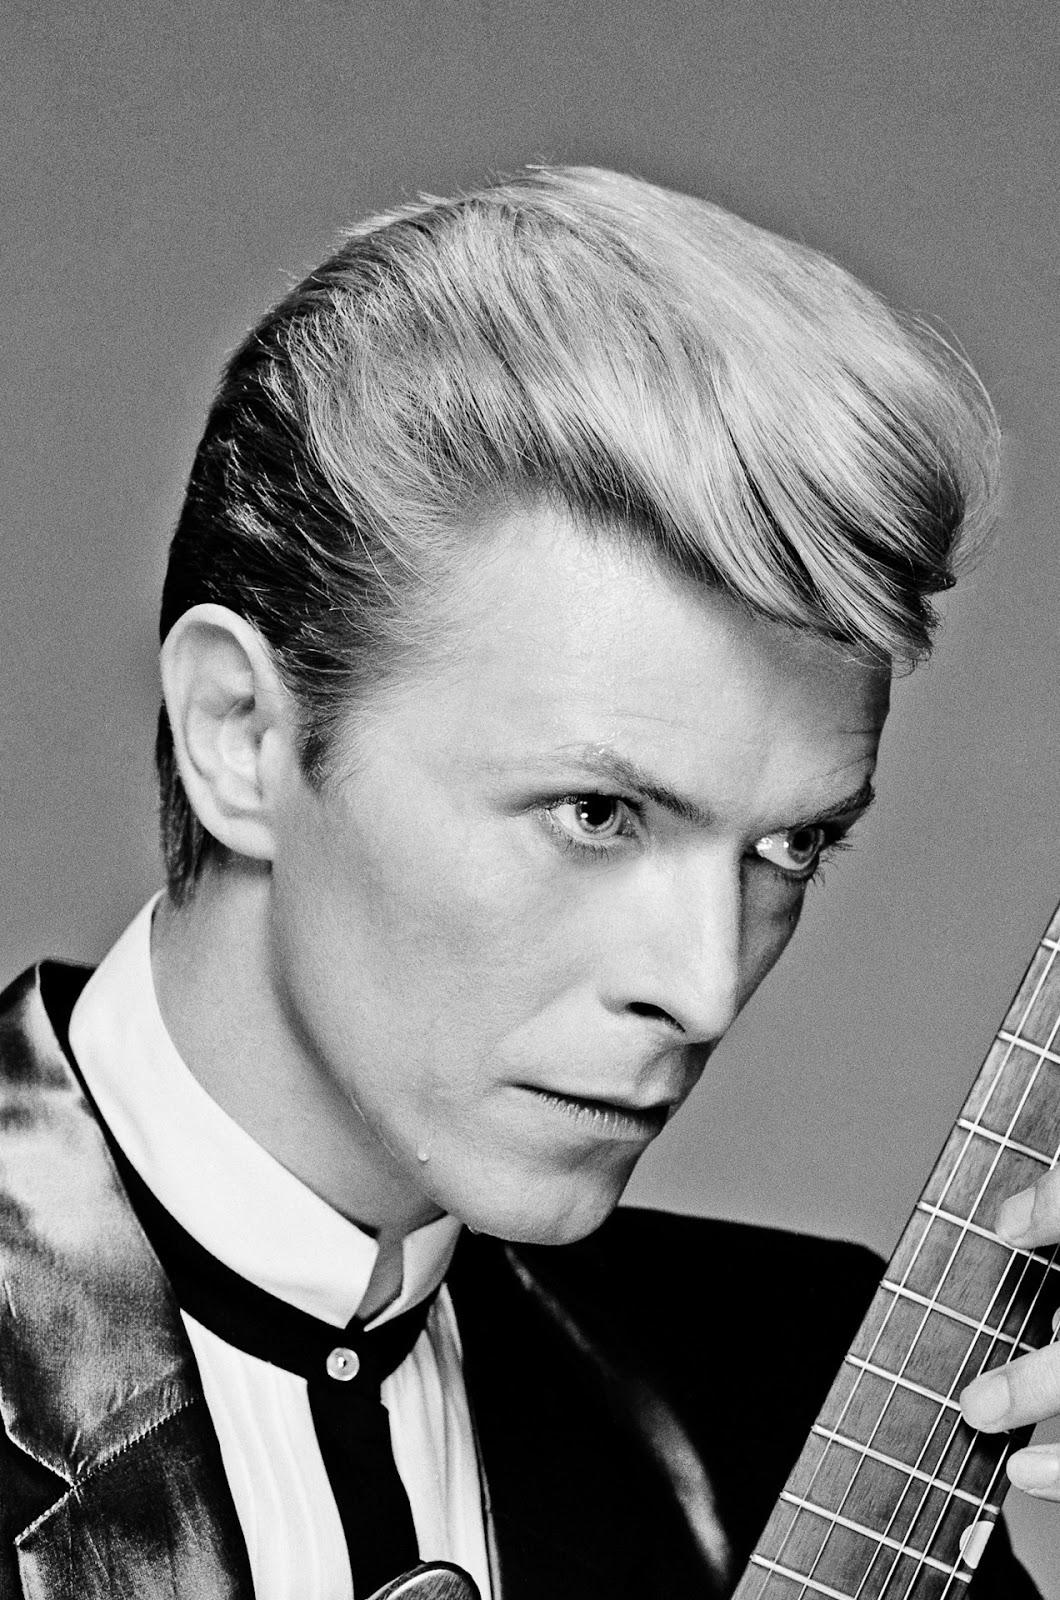 BIOGRAPHIES II: David Bowie / Pop Star